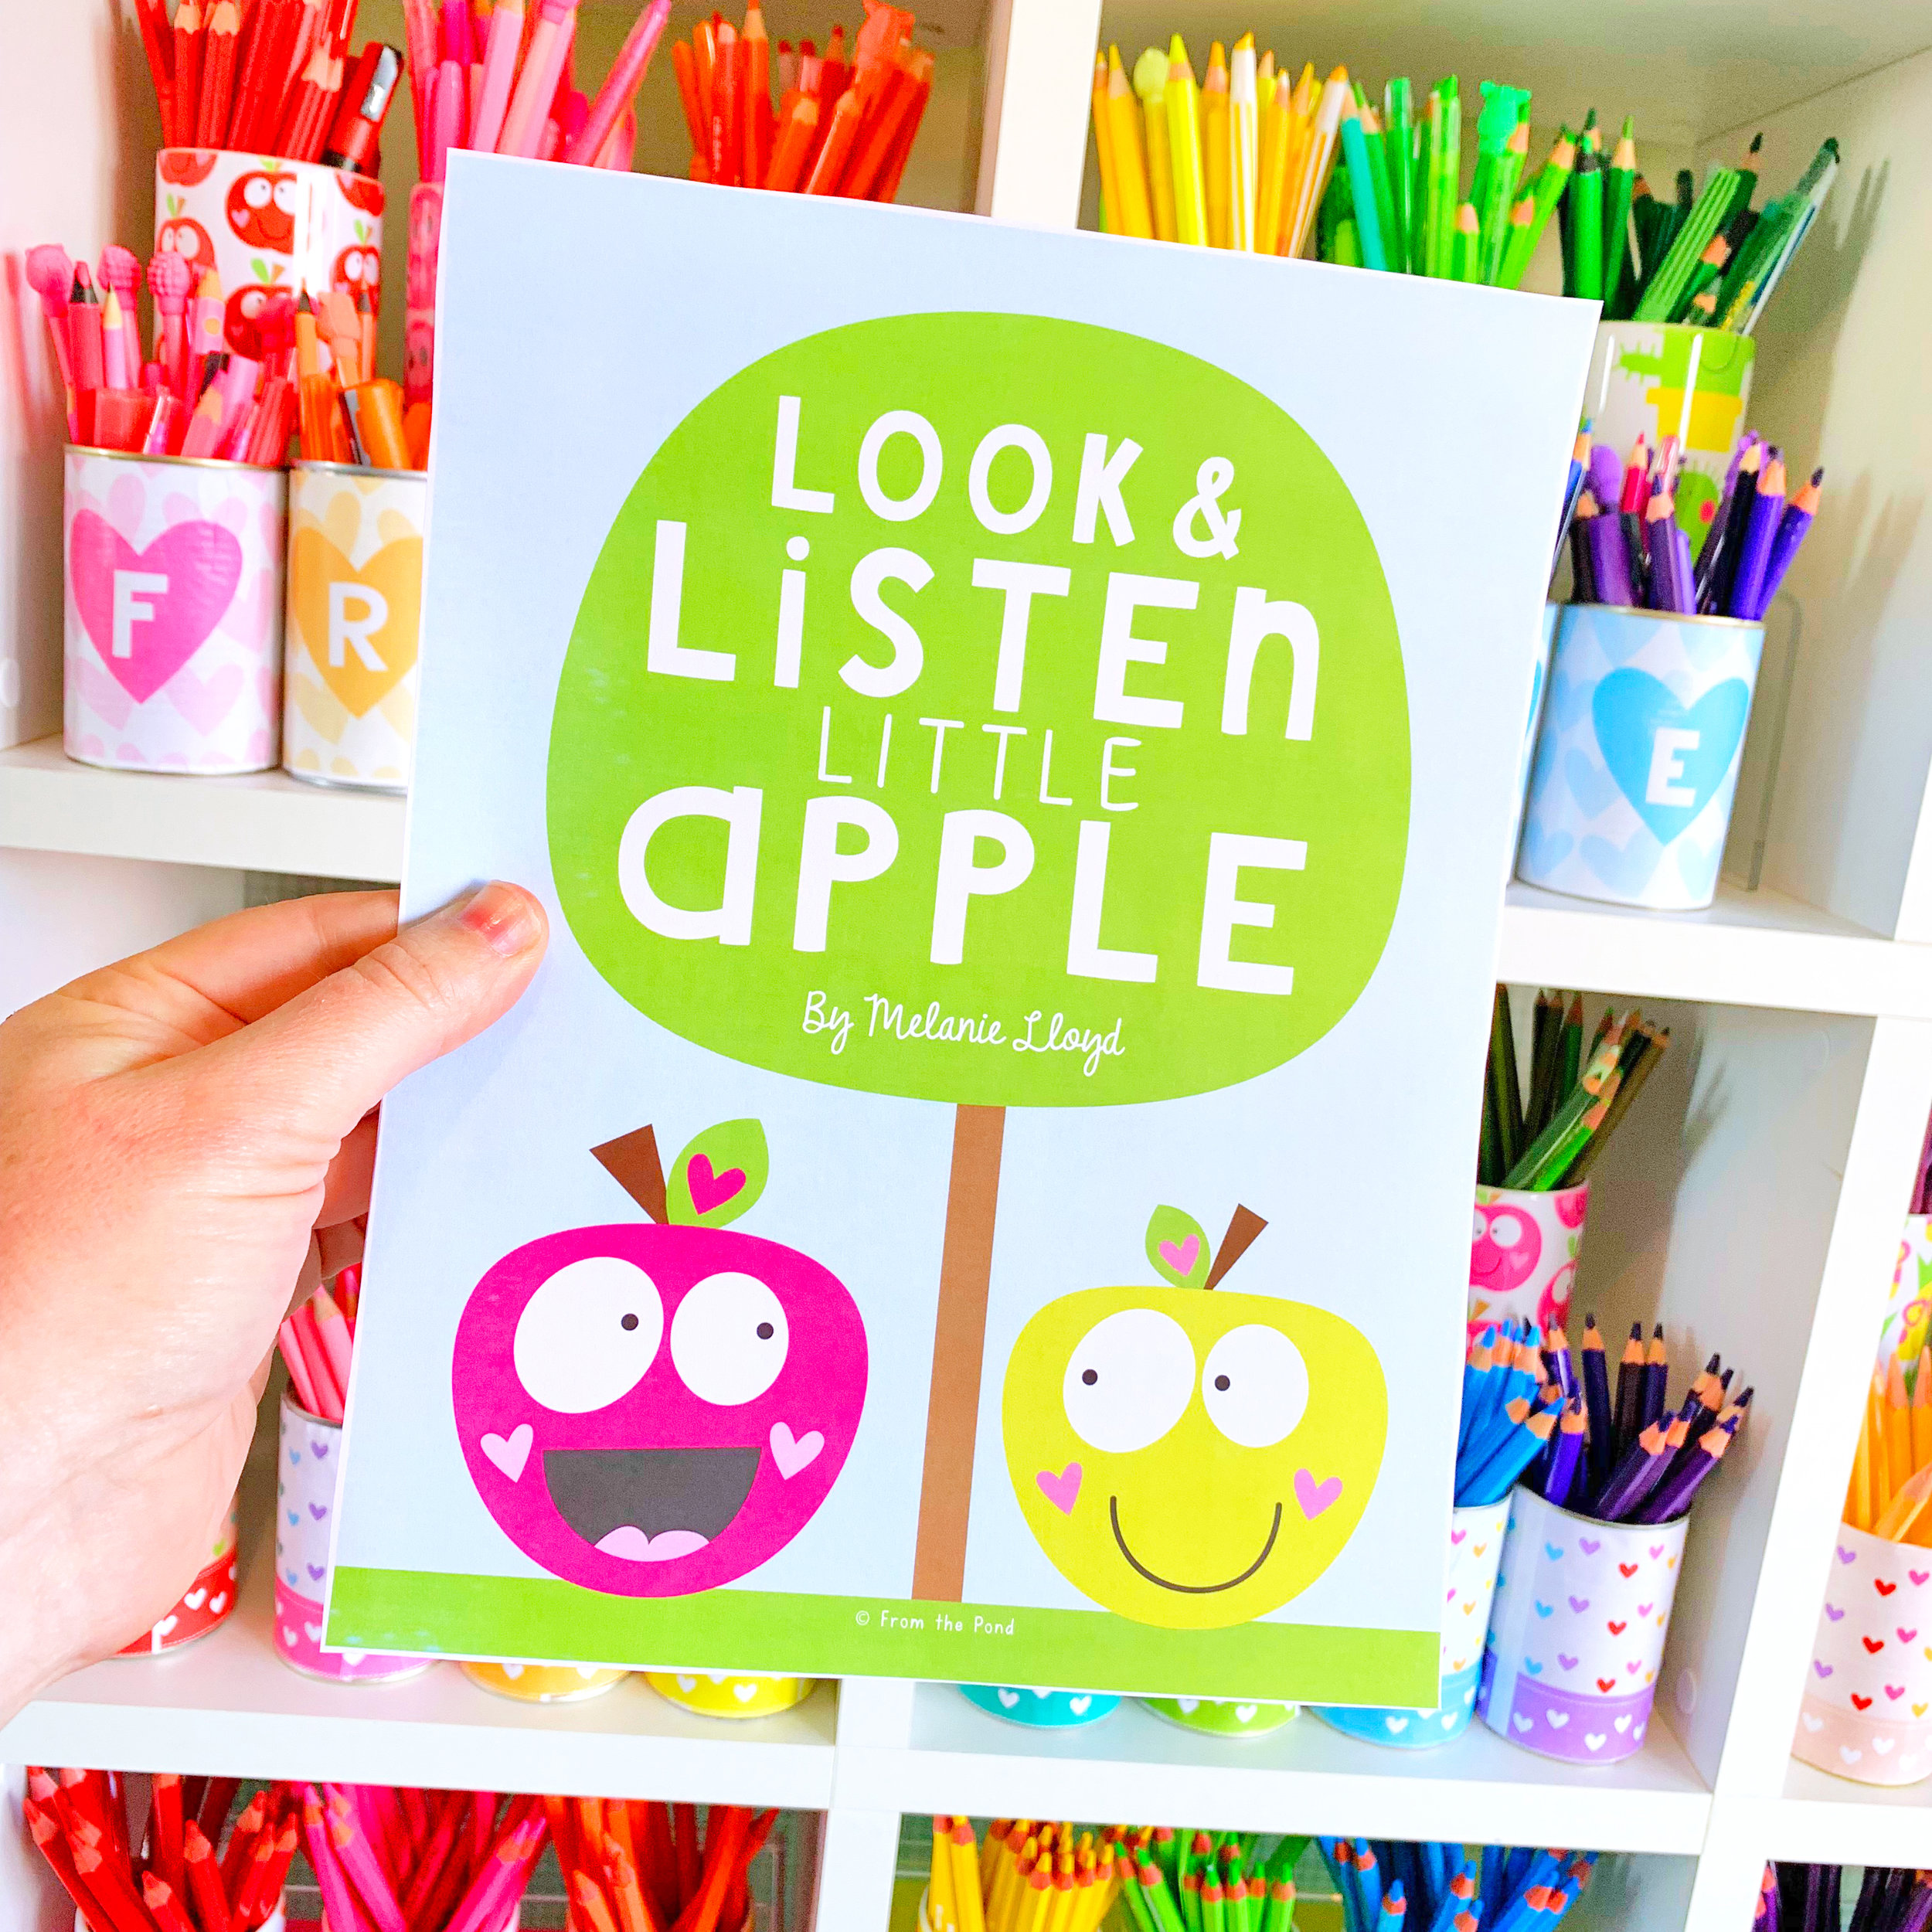 Look & Listen Little Apple Reading Pack